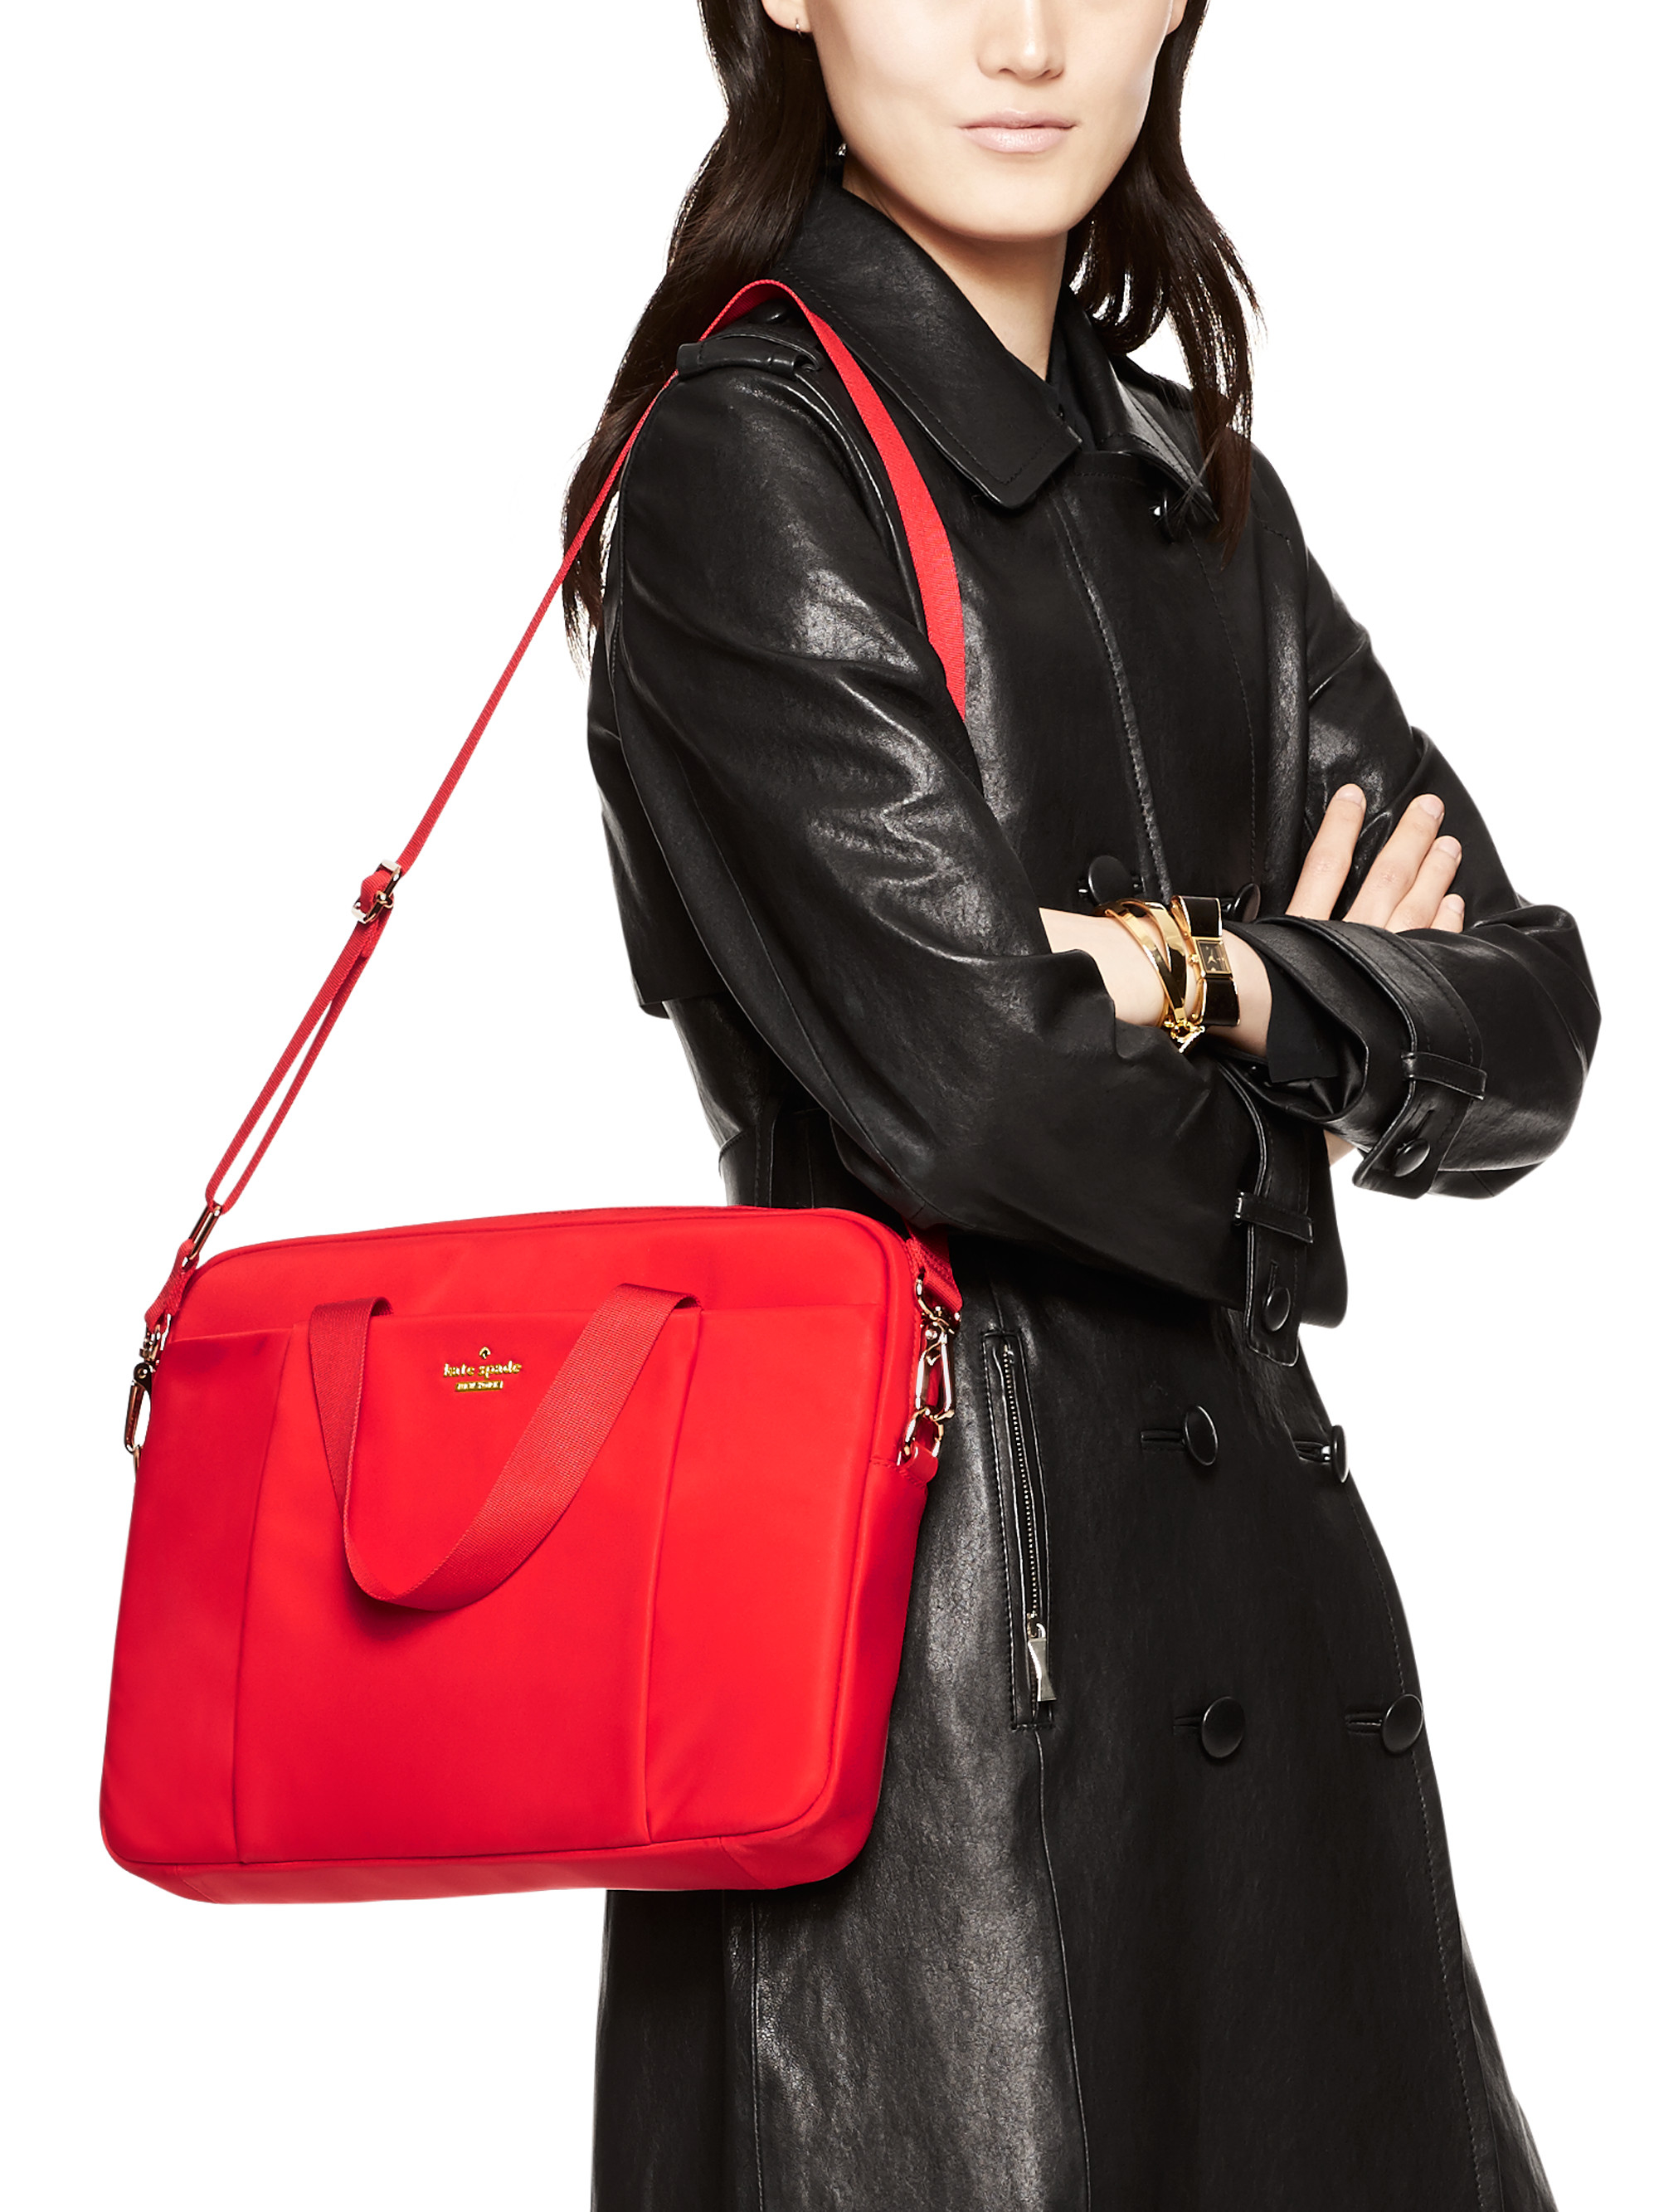 Kate Spade New York Classic Nylon Commuter Laptop Bag In